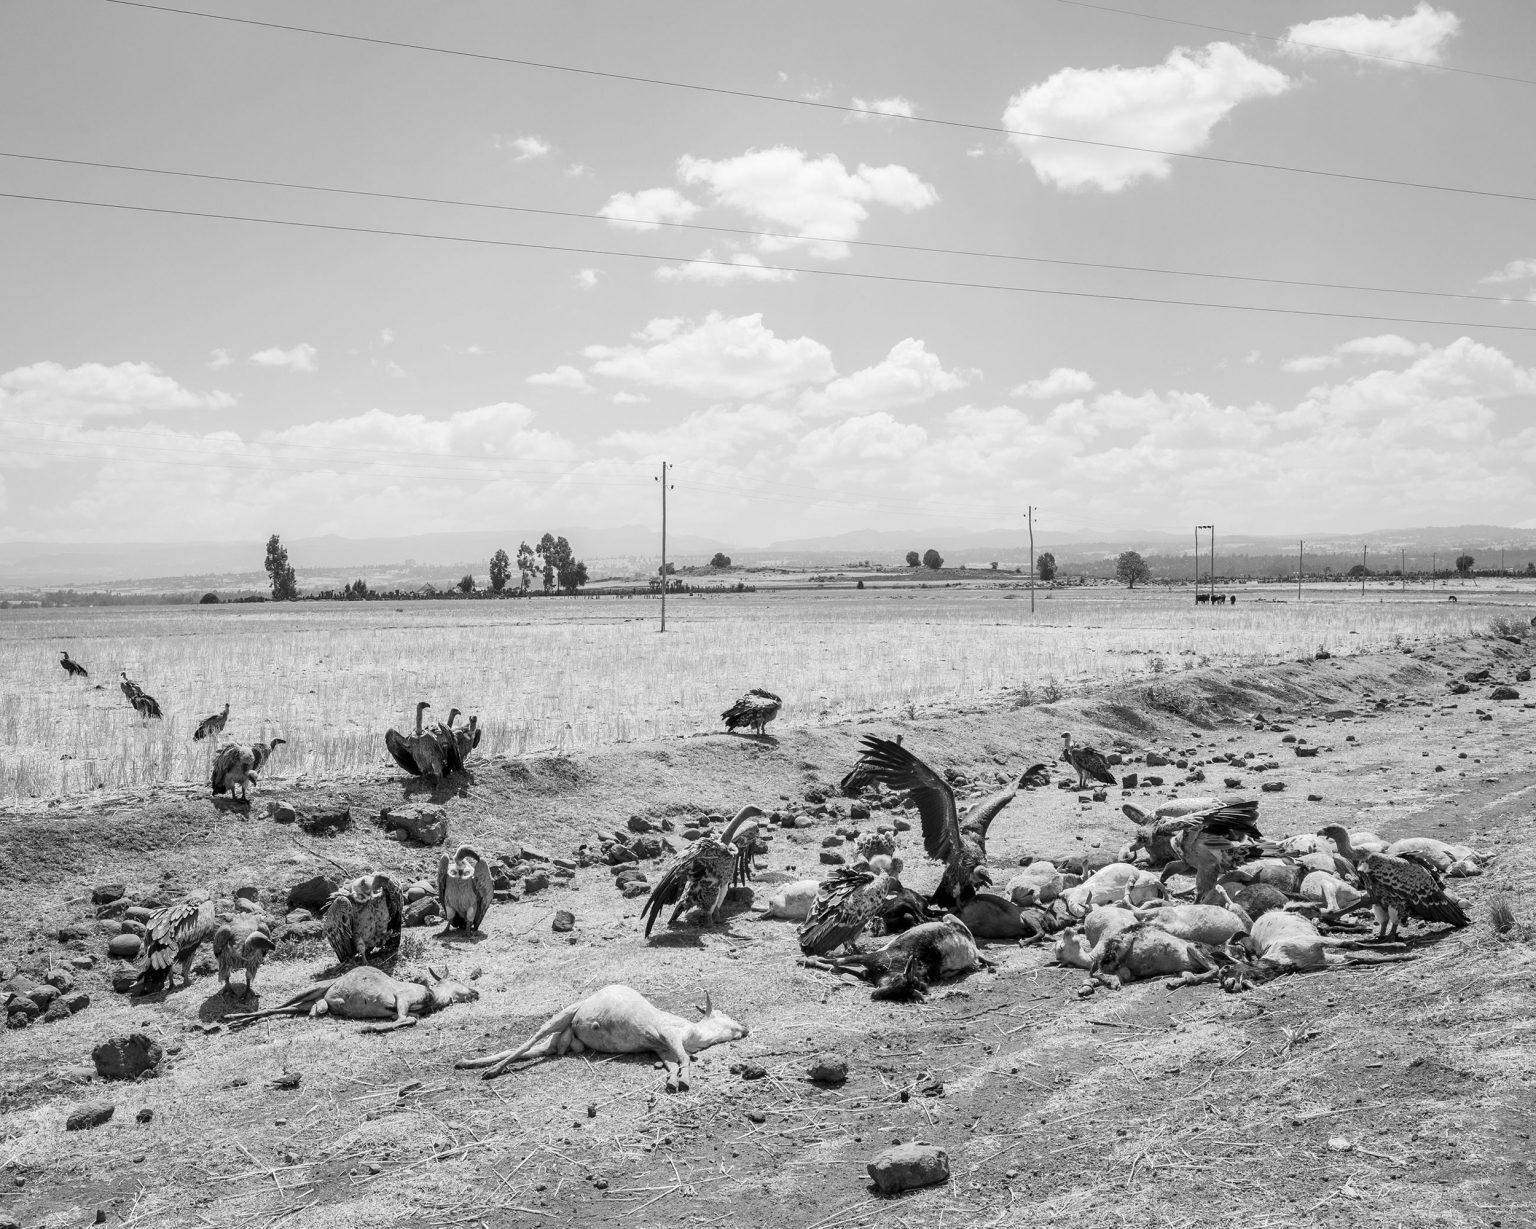 febbraio-2016-etiopia-sulla-strada-da-addis-abeba-verso-goba-regione-delloromia-february-2016-ethiopia-on-the-road-from-addis-ababa-to-goba-oromia-region